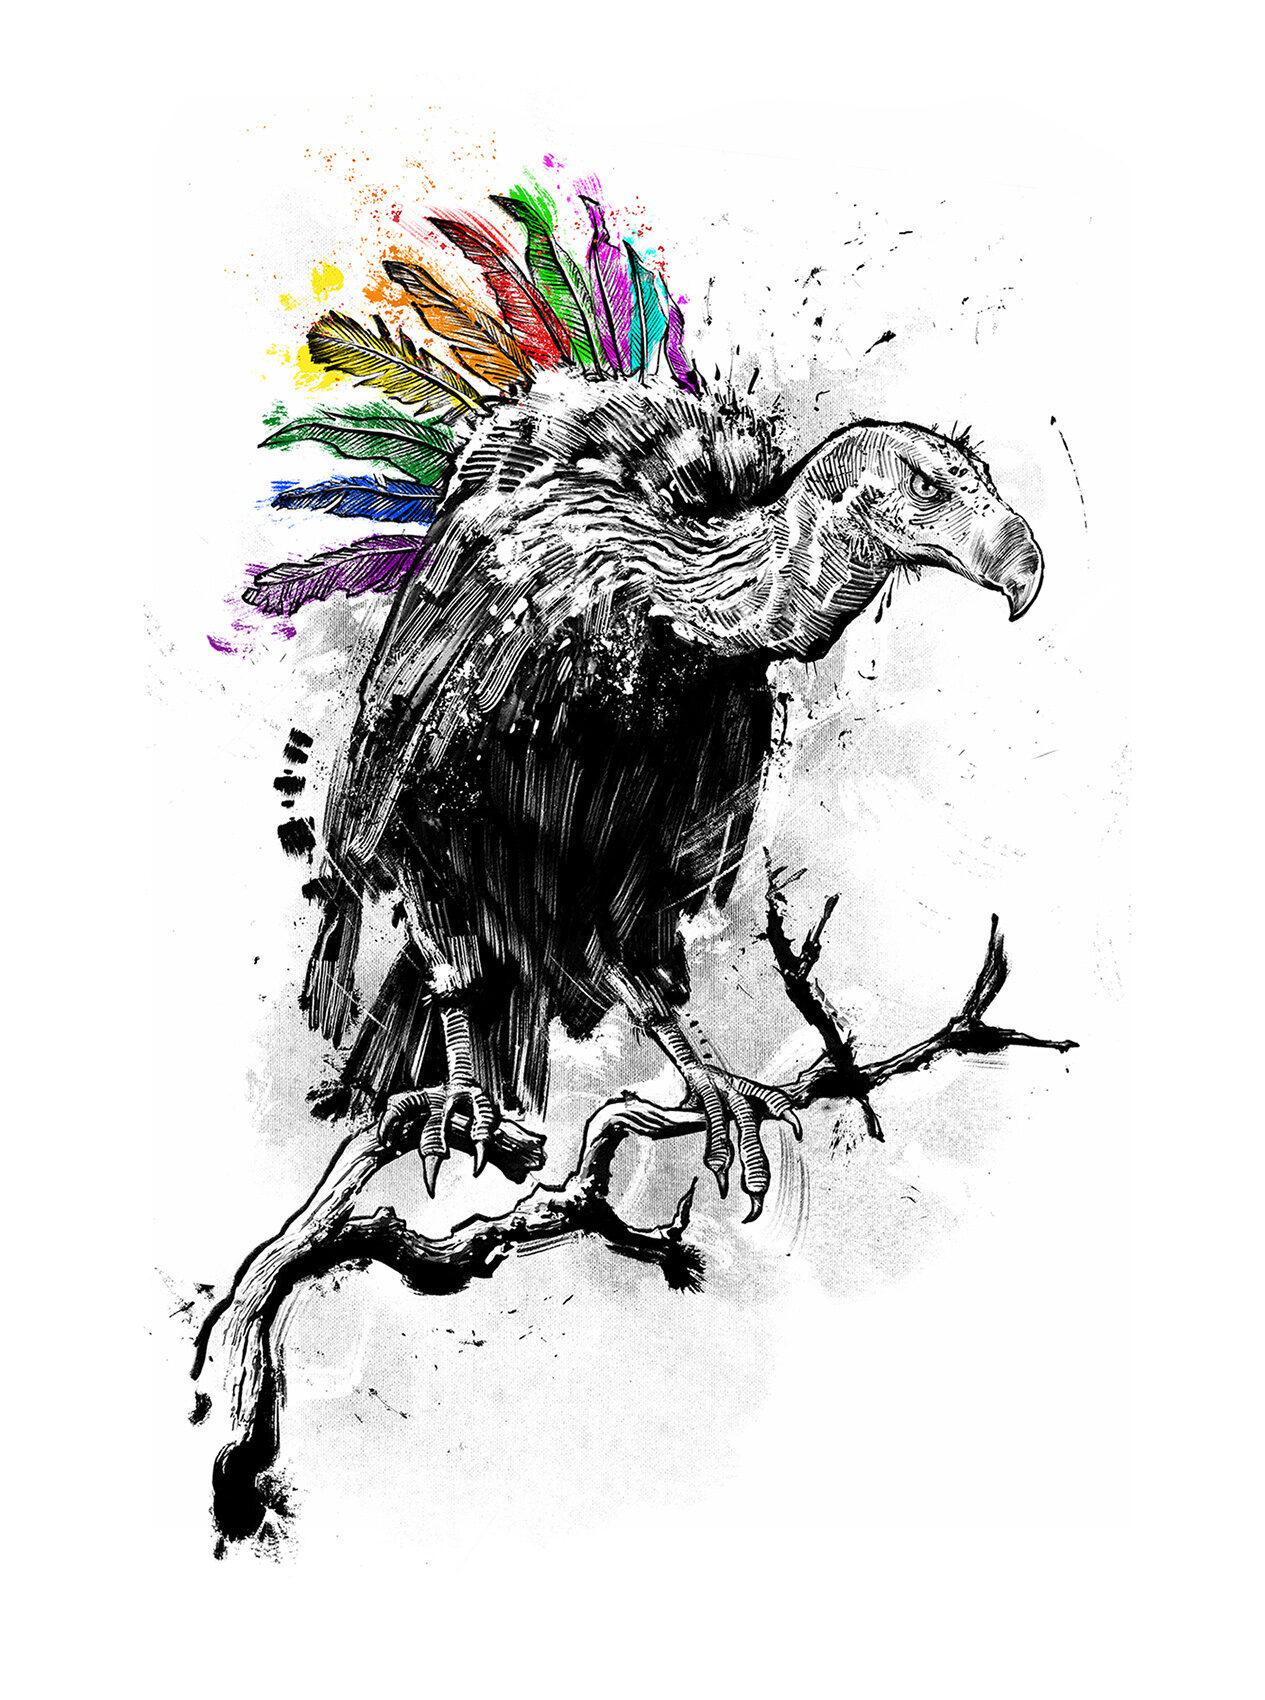 Pride geier illustration diversity rainbow regenbogen vulture - Kornel Illustration | Kornel Stadler portfolio